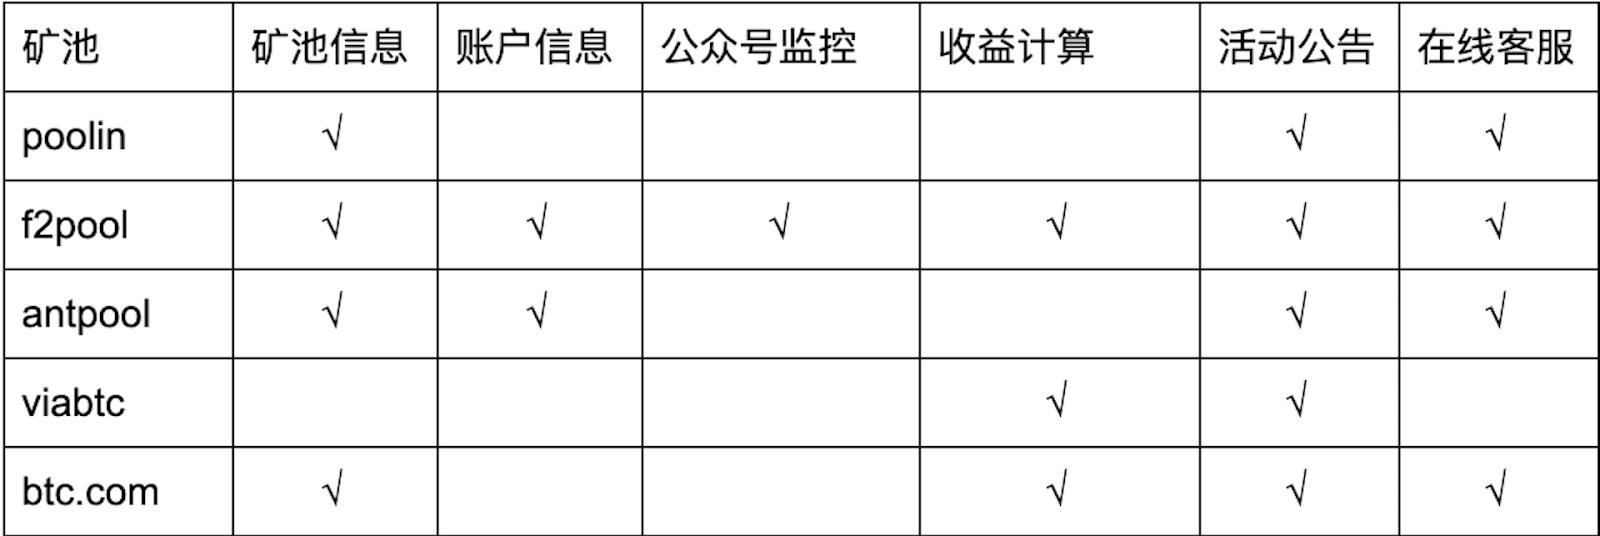 FjrFpH4sTqAsvjaZavspDOG0DAQH - 【测评】莱特币矿池测评 | 第一期 | 矿池人性化服务